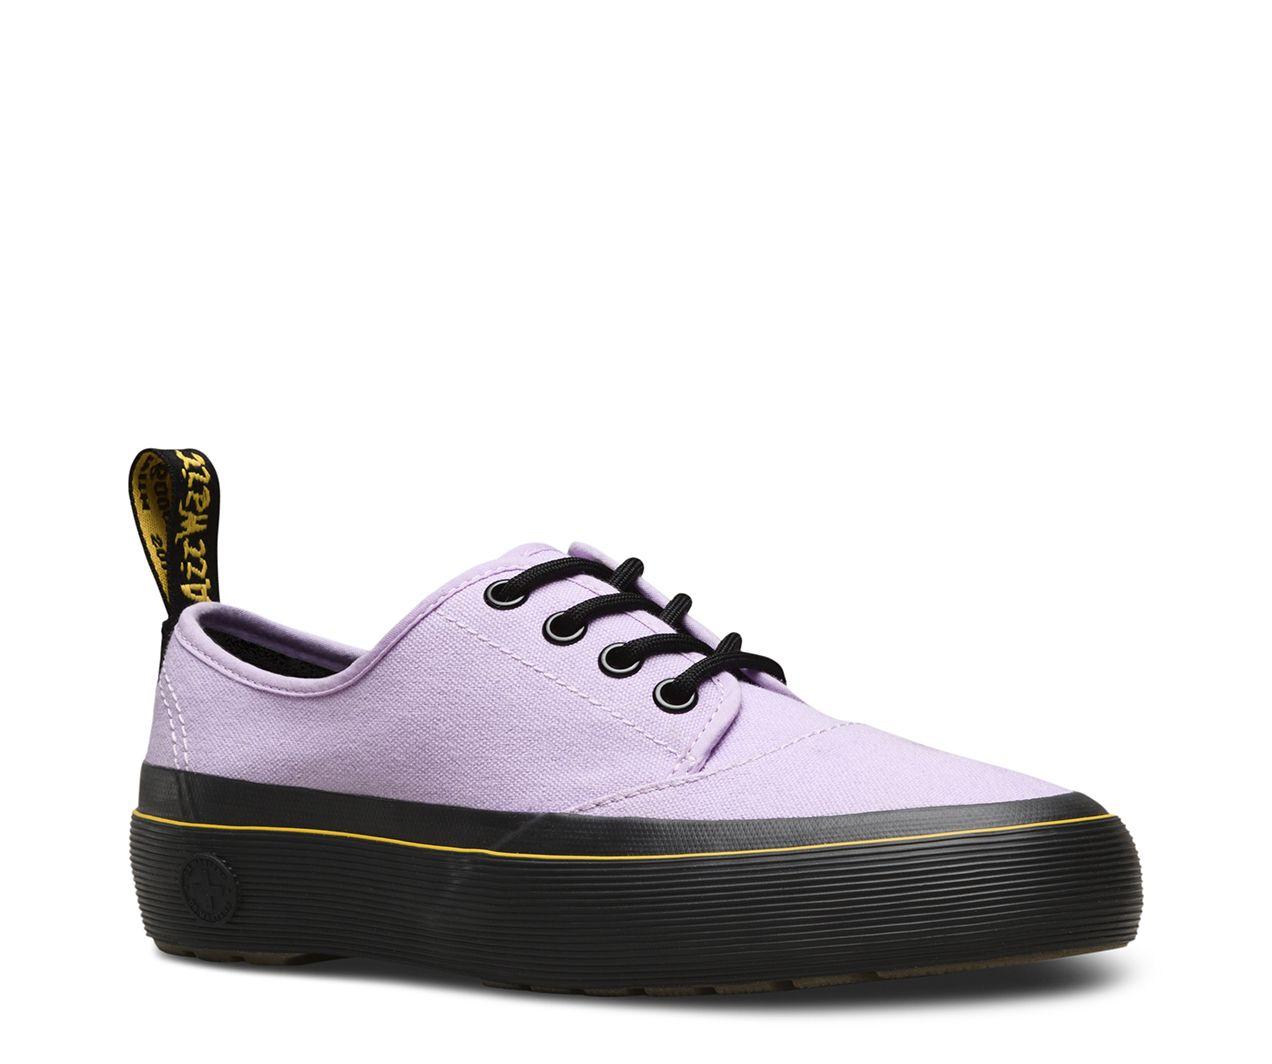 The Jacy serves up \u0026#39;90s sneaker